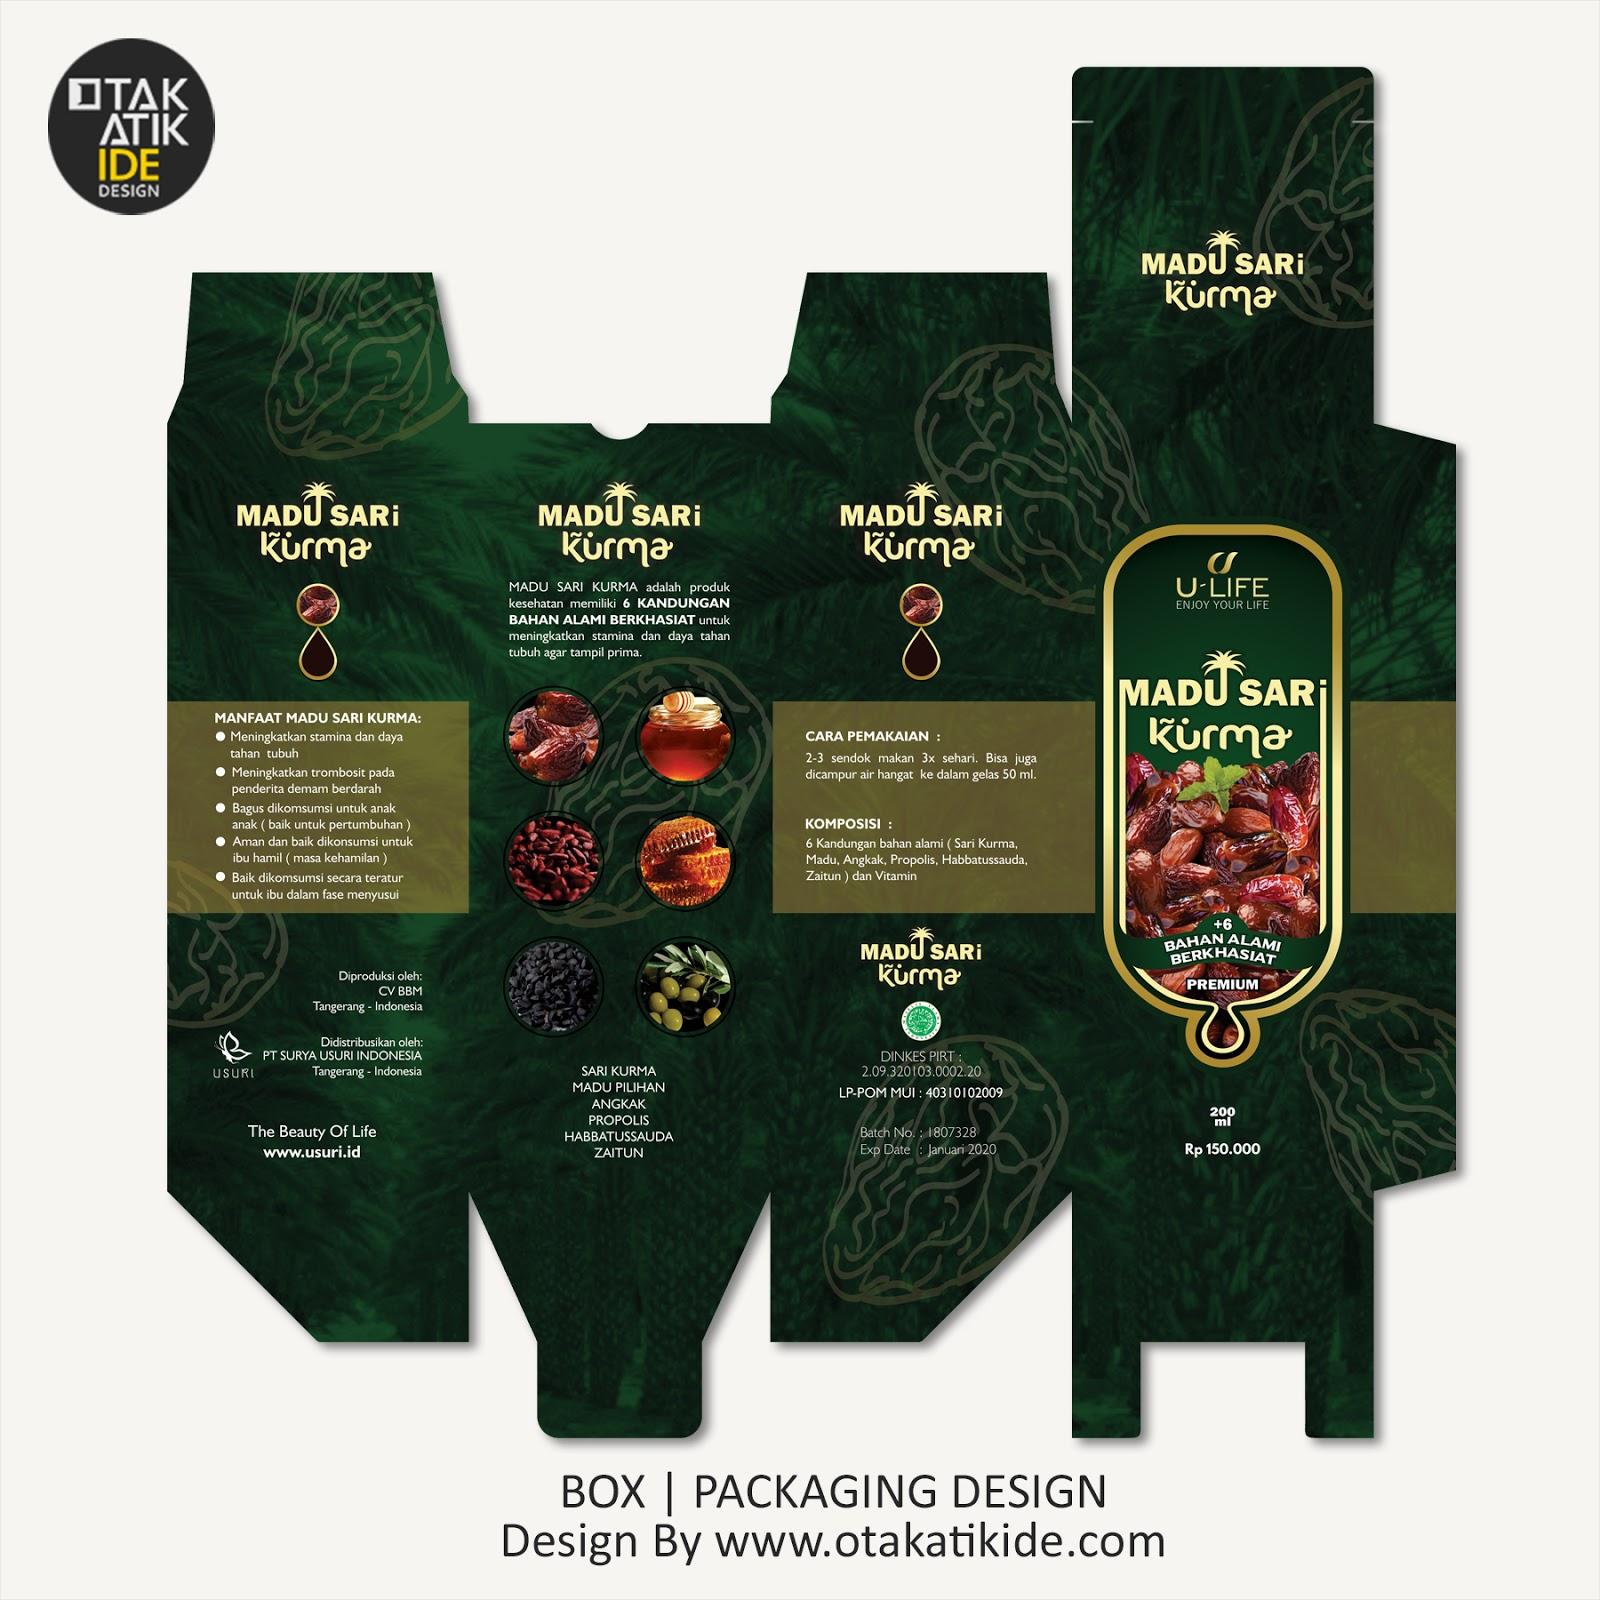 Desain Kemasan Pouch: Jasa Desain Di Jakartajasa Desain Kemasan Produk Ukm, Logo